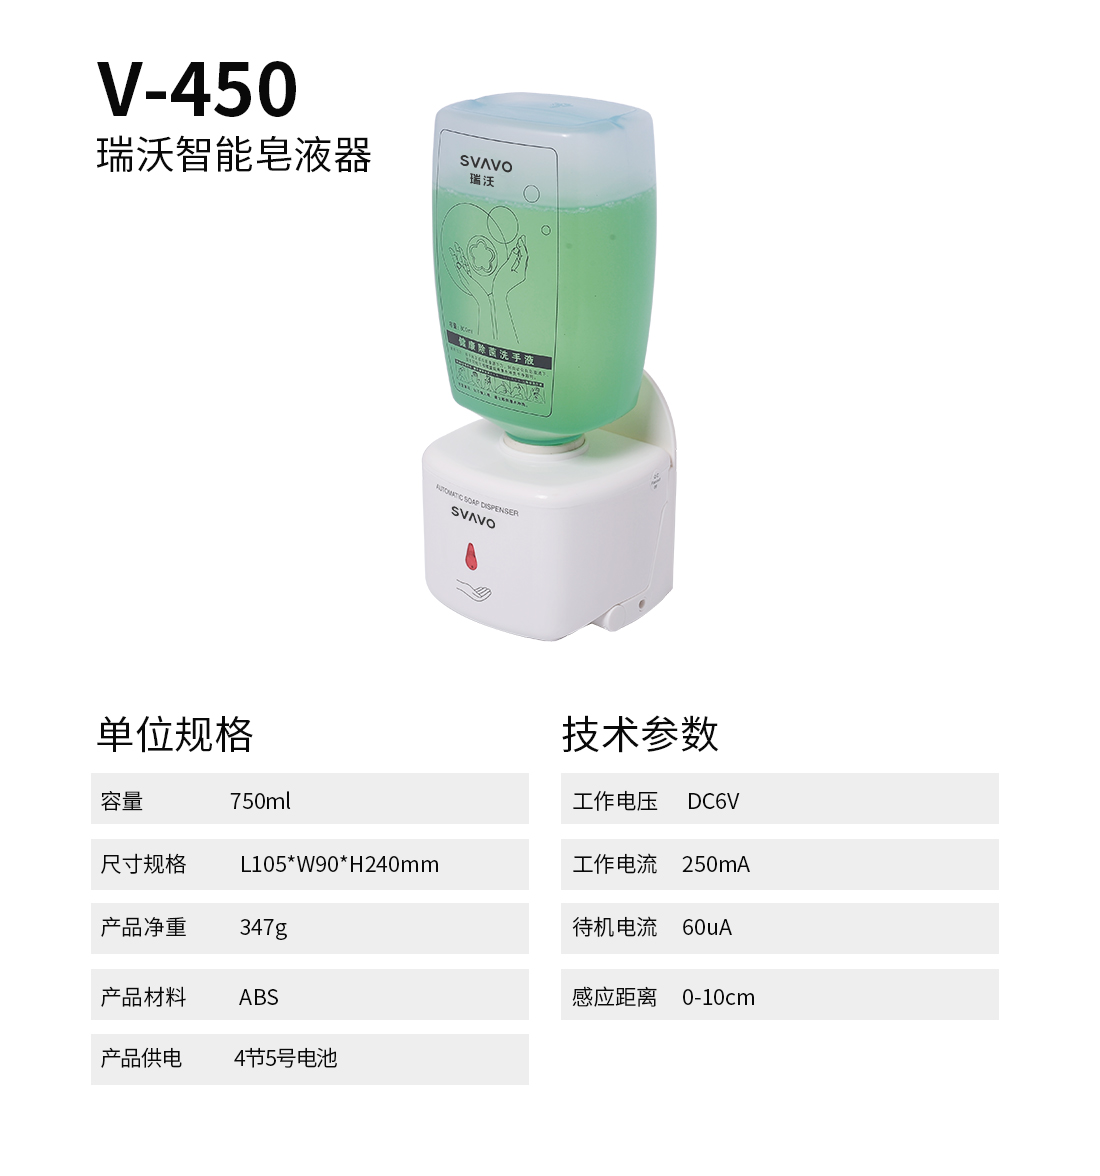 V-450